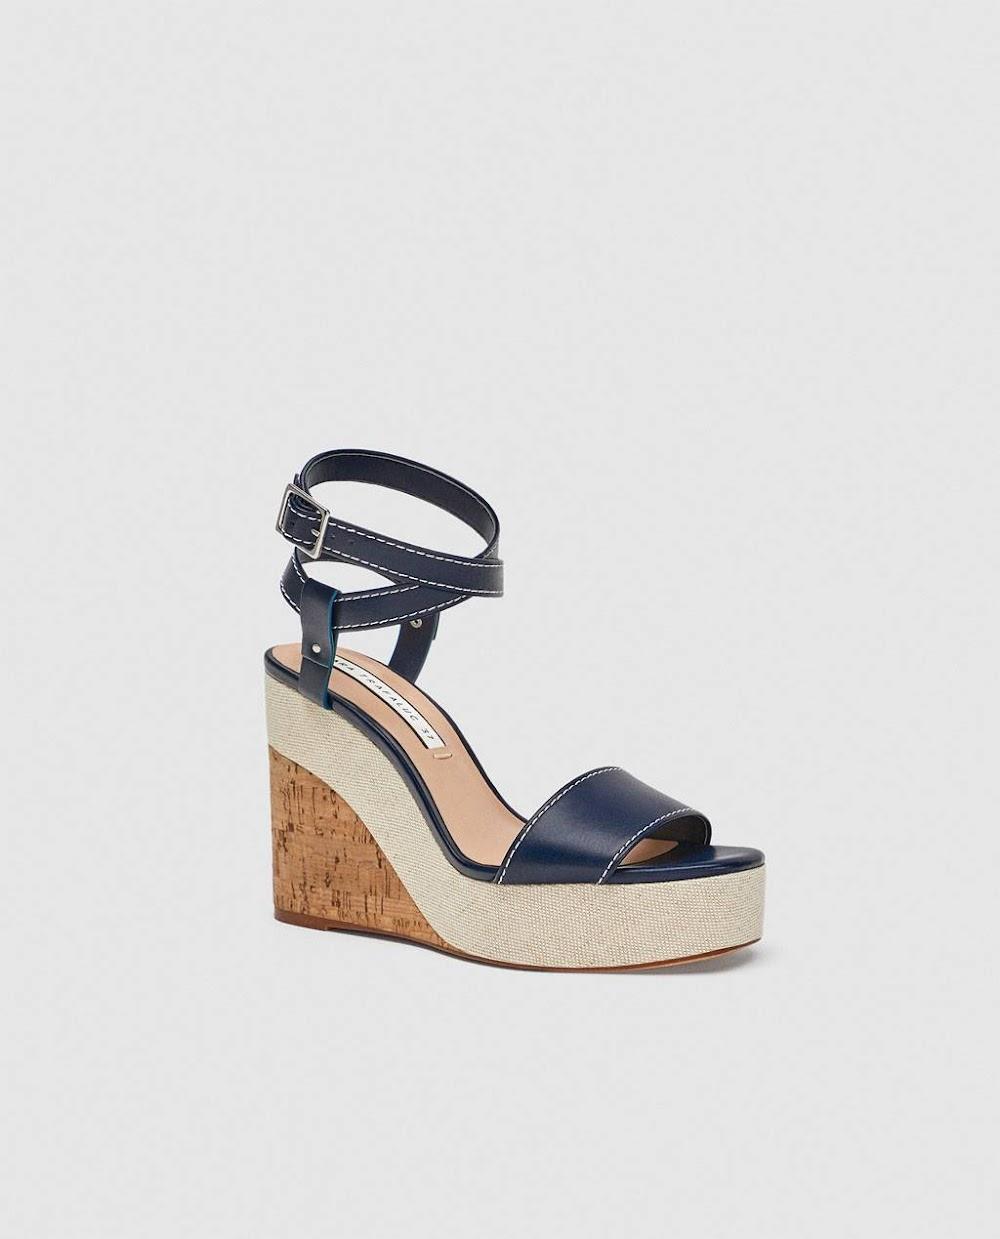 contrast_wedge_high_heels_image